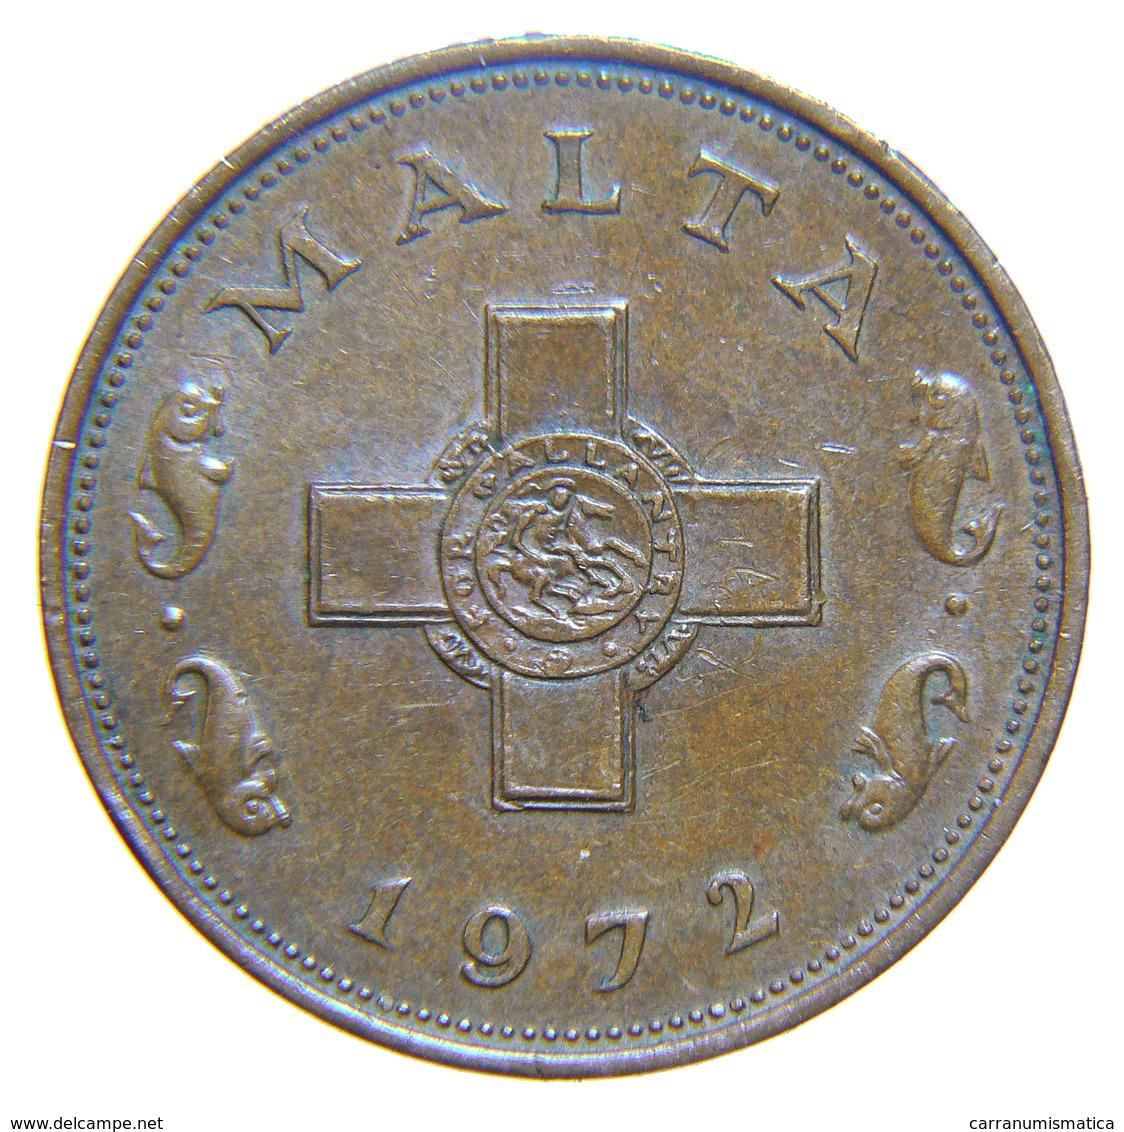 [NC] MALTA - 1 CENT 1972 (nc3611) - Malta